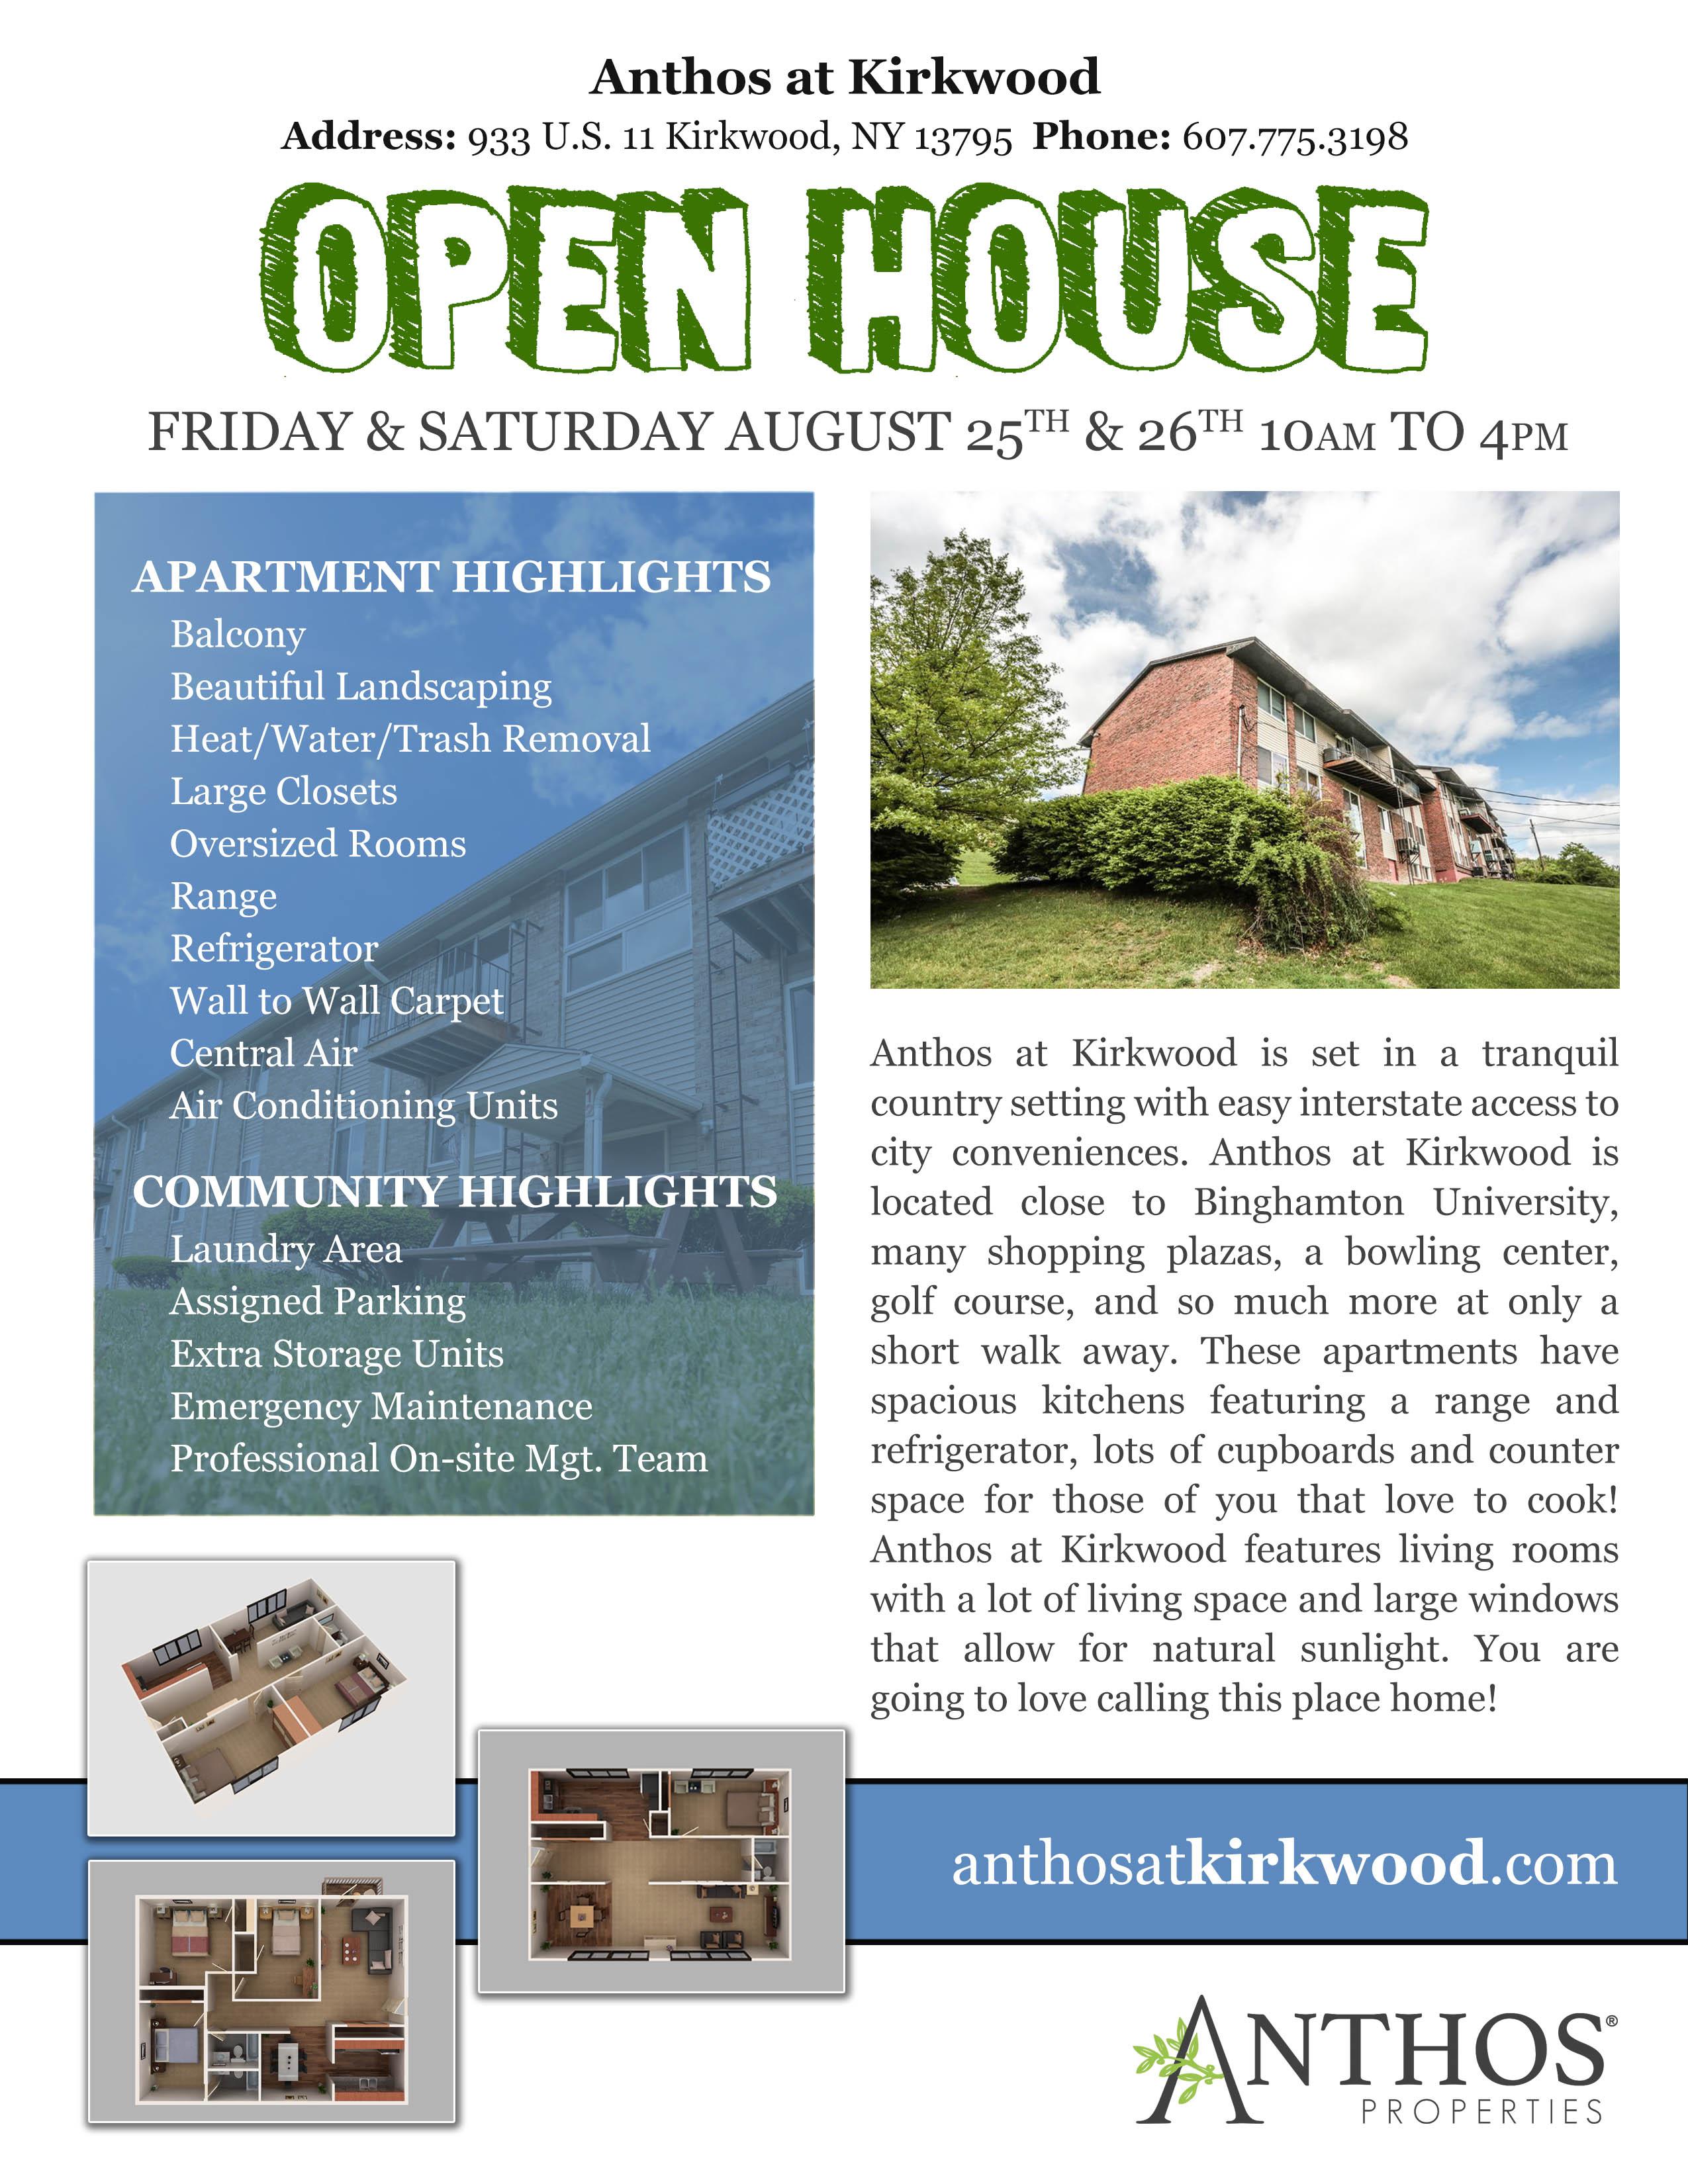 anthos at kirkwood open house | anthos properties